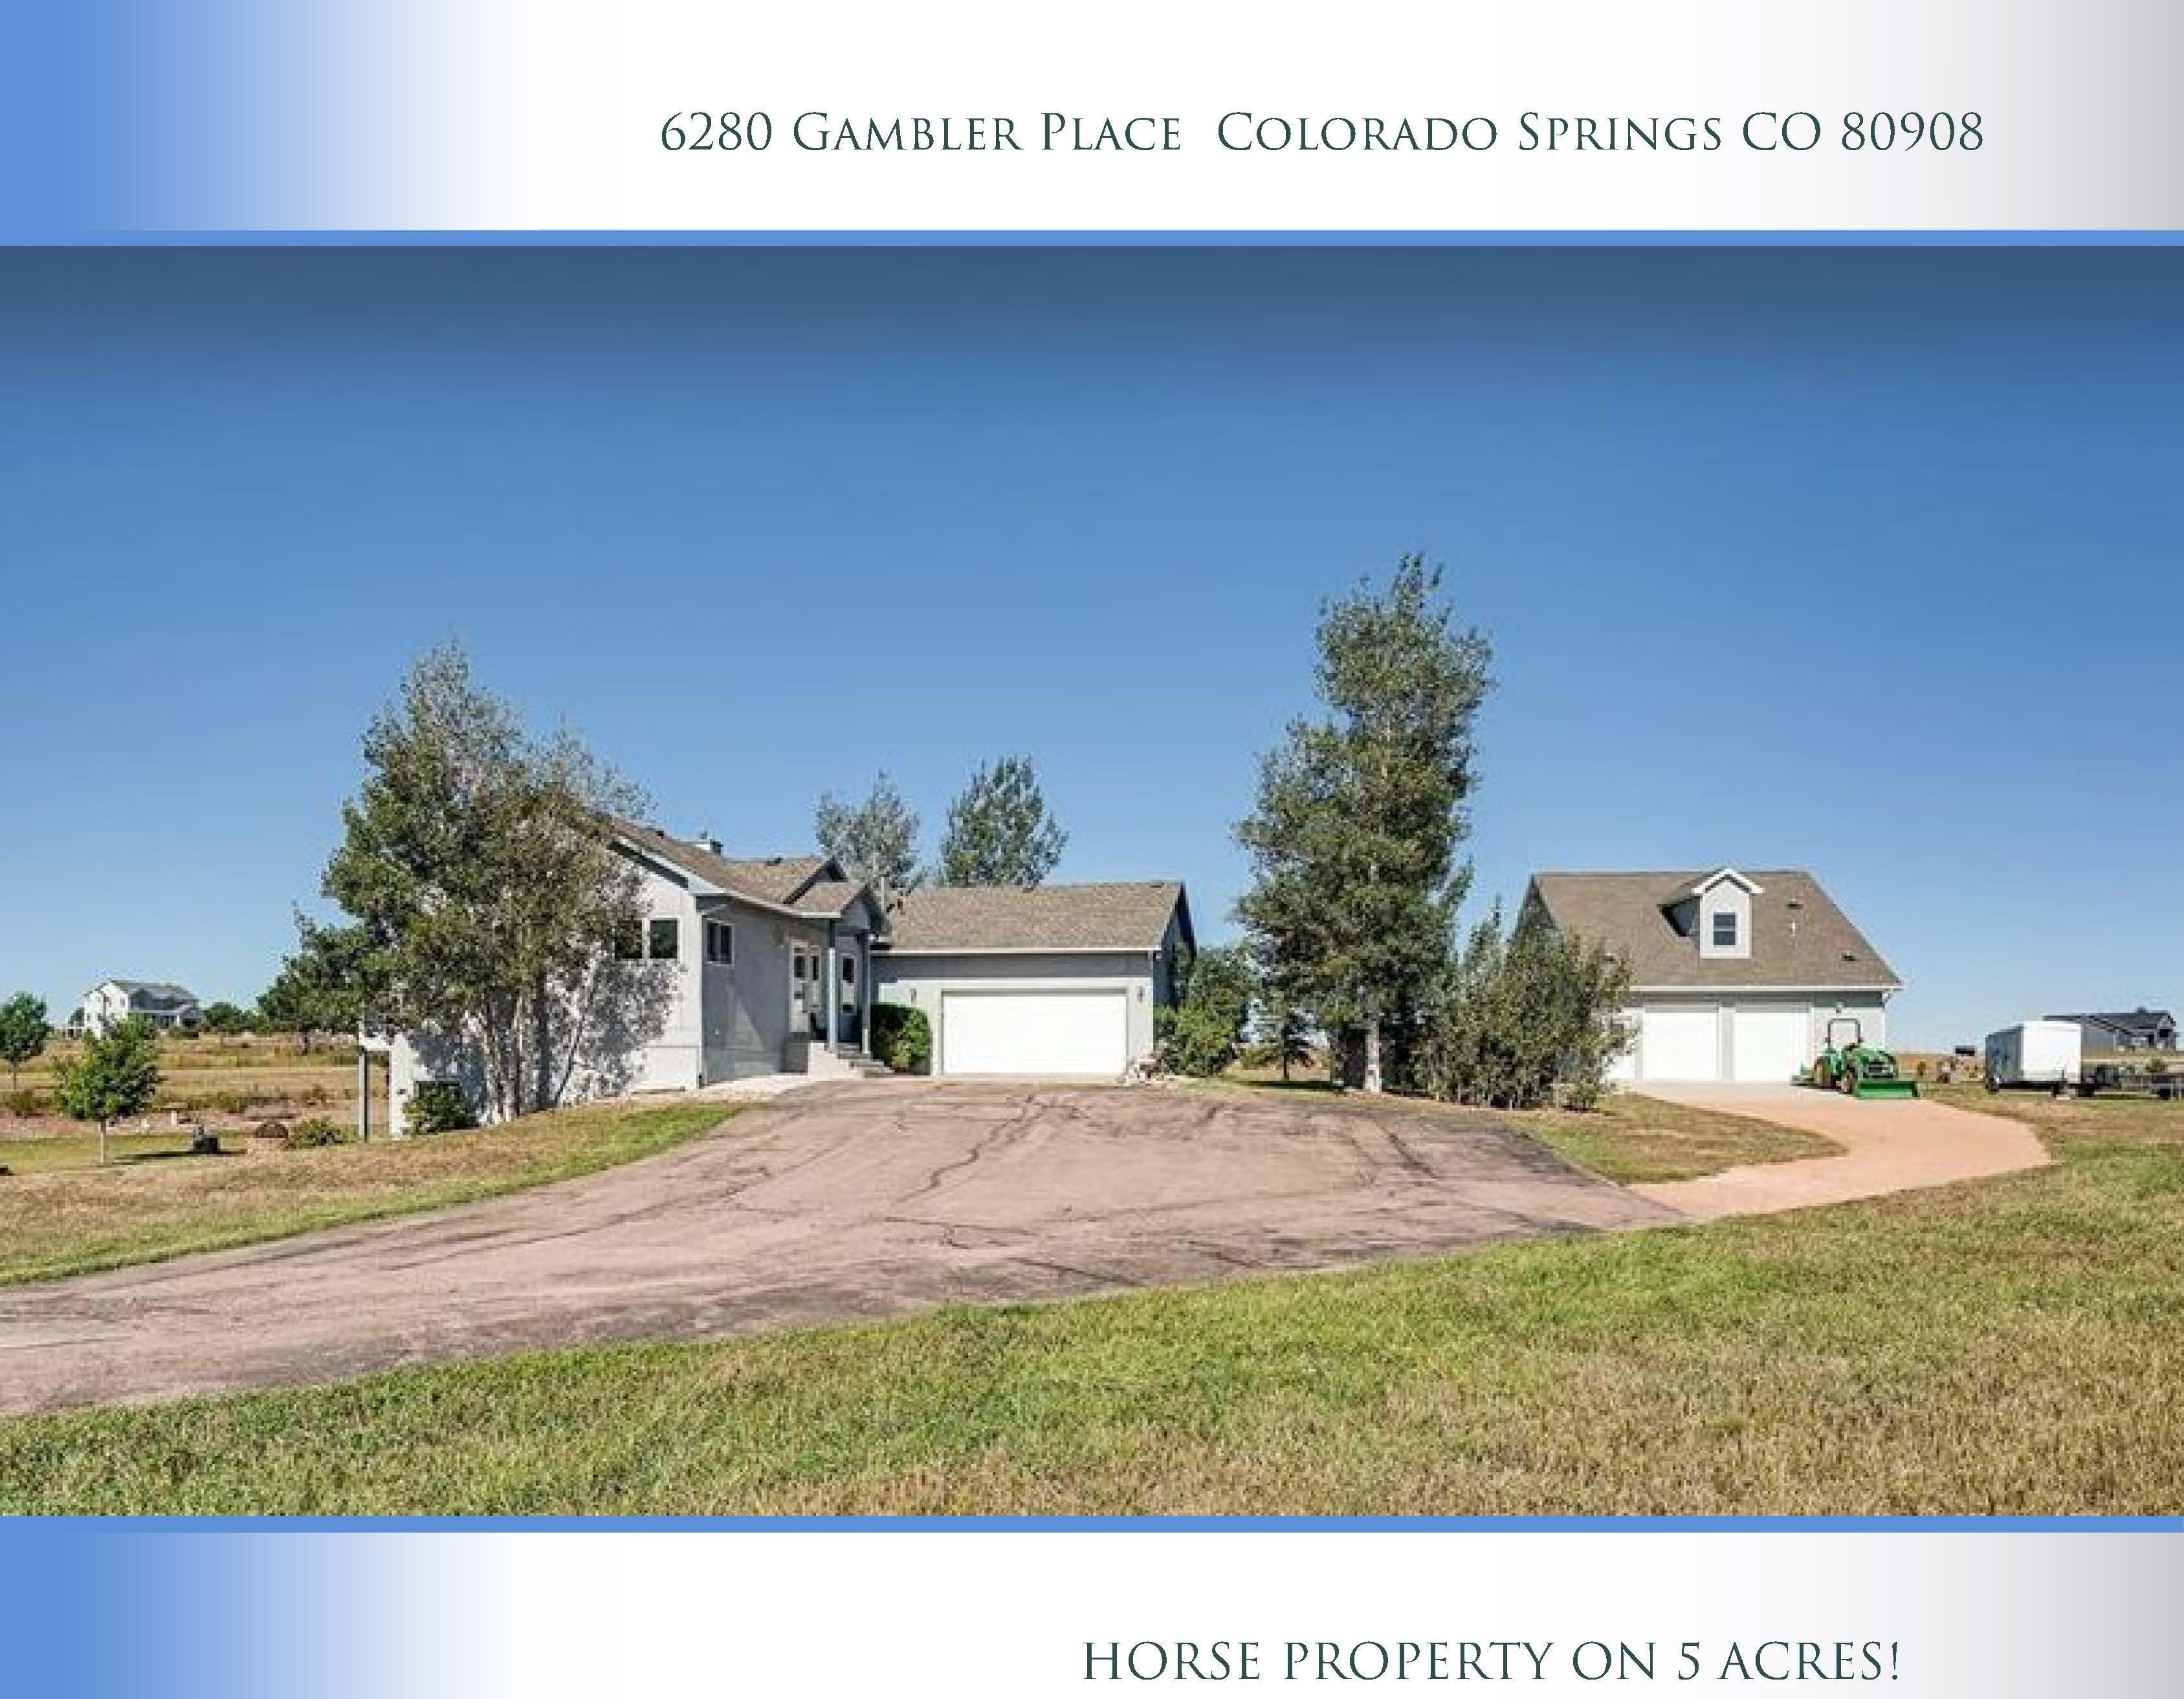 Horse Property on 5 Acres! Horse property, Surround